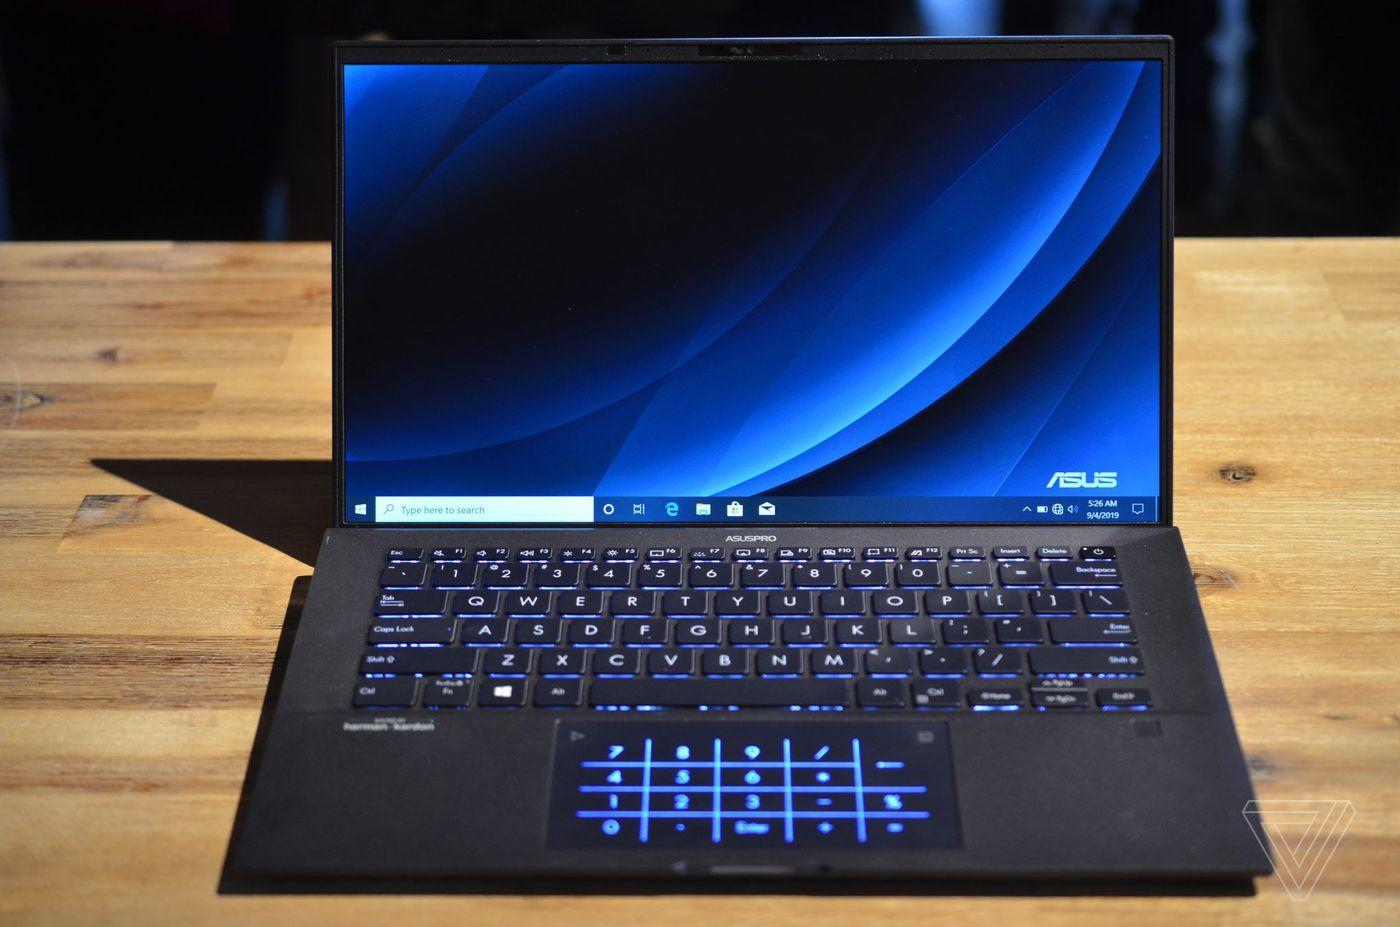 Cara Merawat LCD Laptop Dengan Benar Supaya Awet